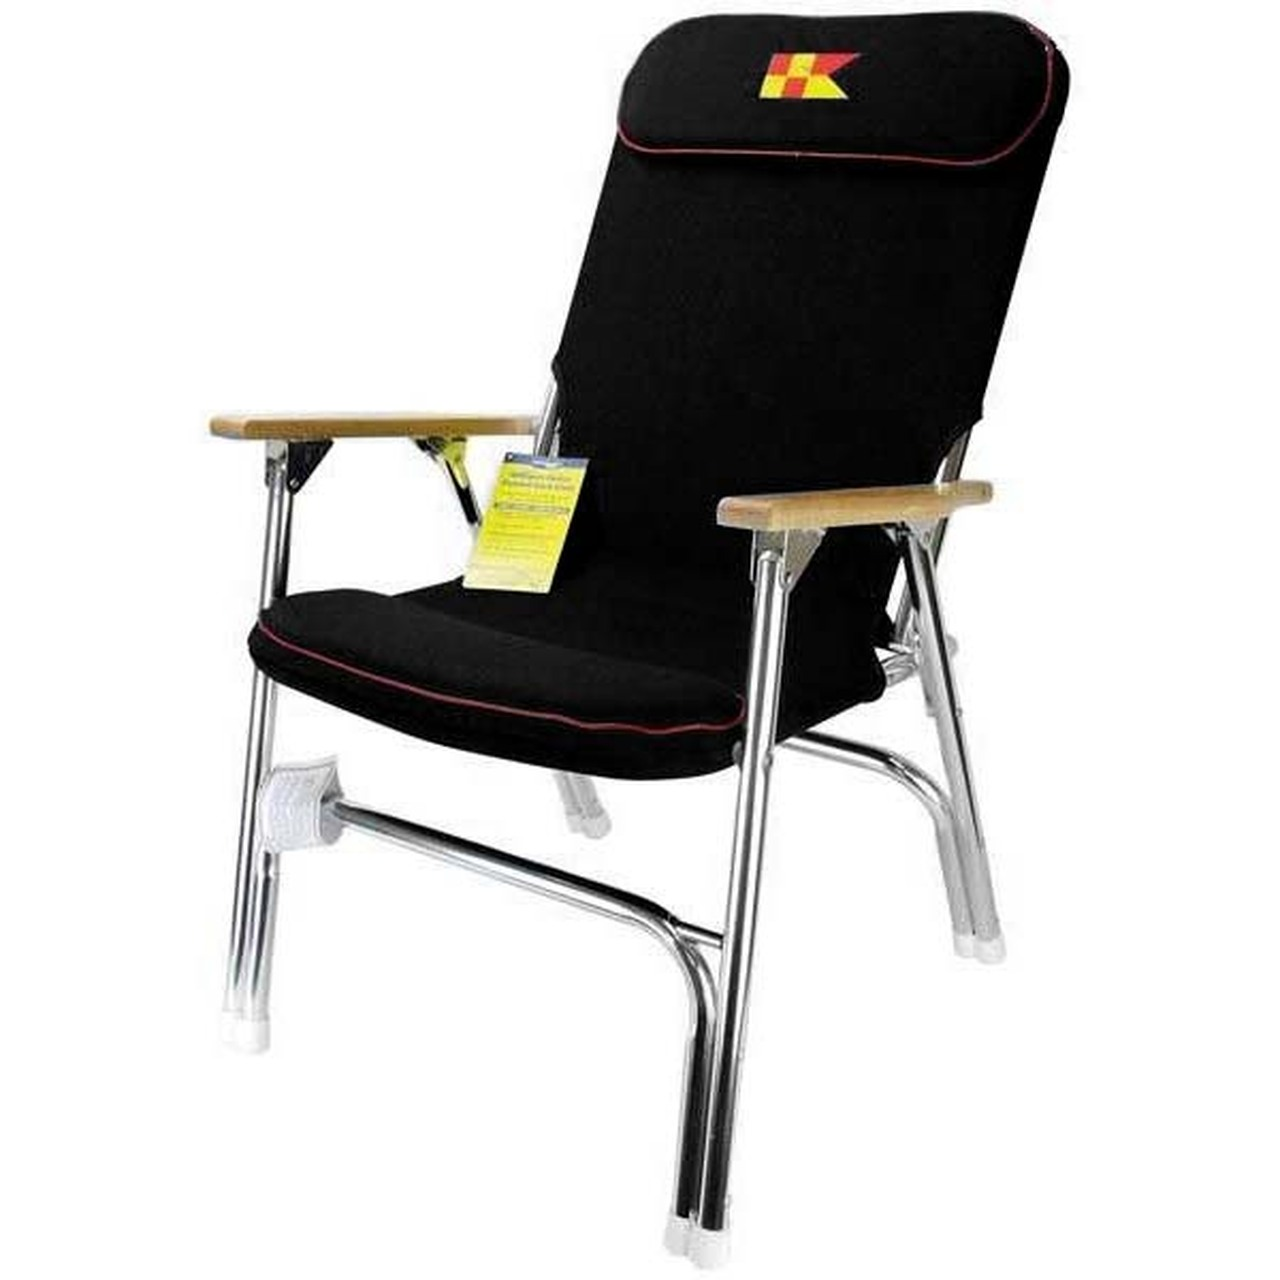 Pleasant Garelick Padded Folding Deck Chair Black Short Links Chair Design For Home Short Linksinfo